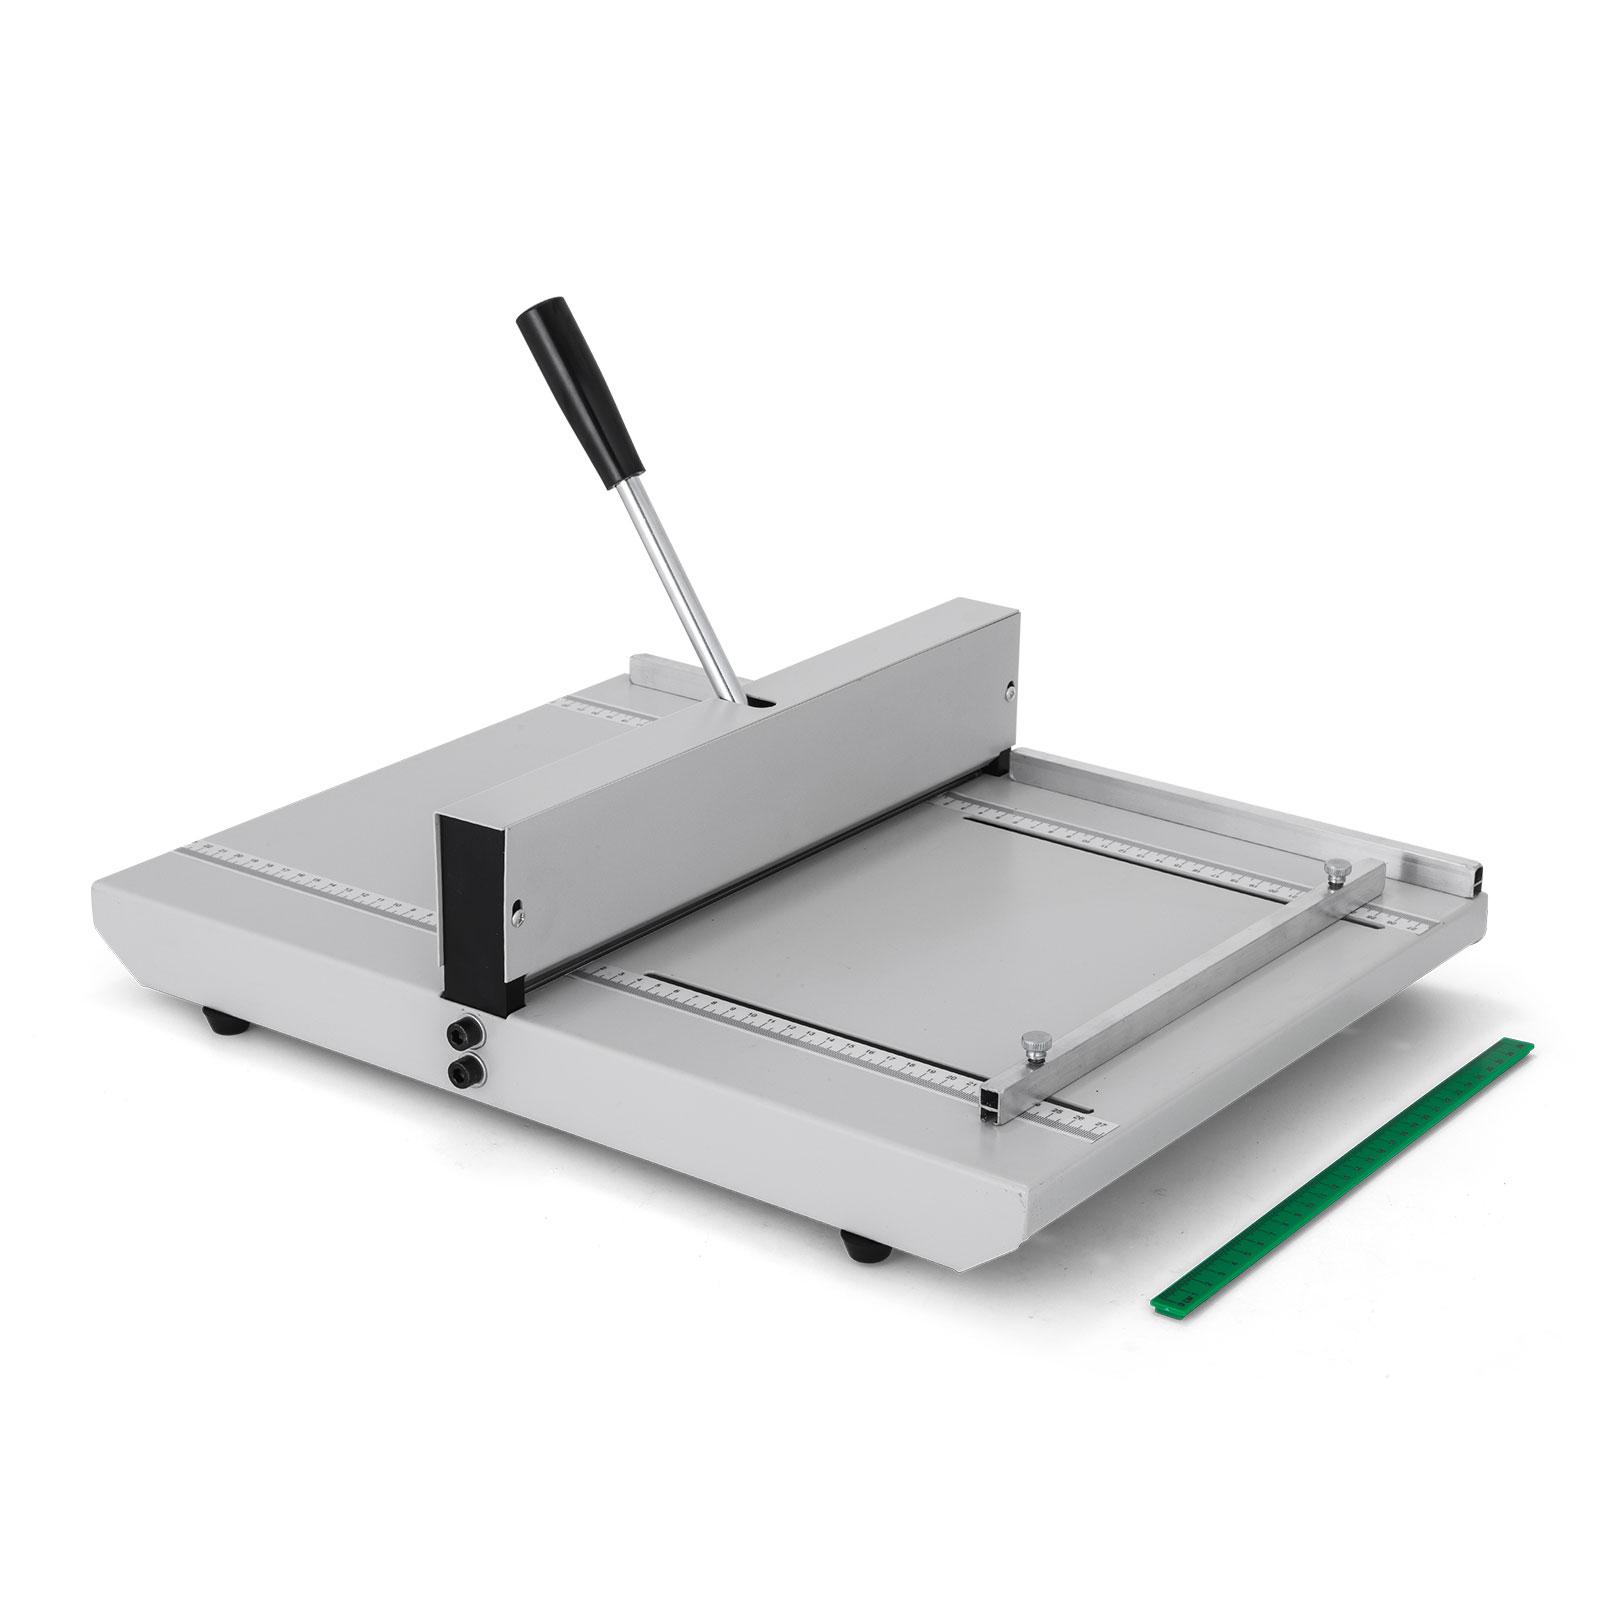 Cordonatrice-Perforatrice-Max-350-520mm-Profondita-Regolabile-Elettrica-Manuale miniatura 62